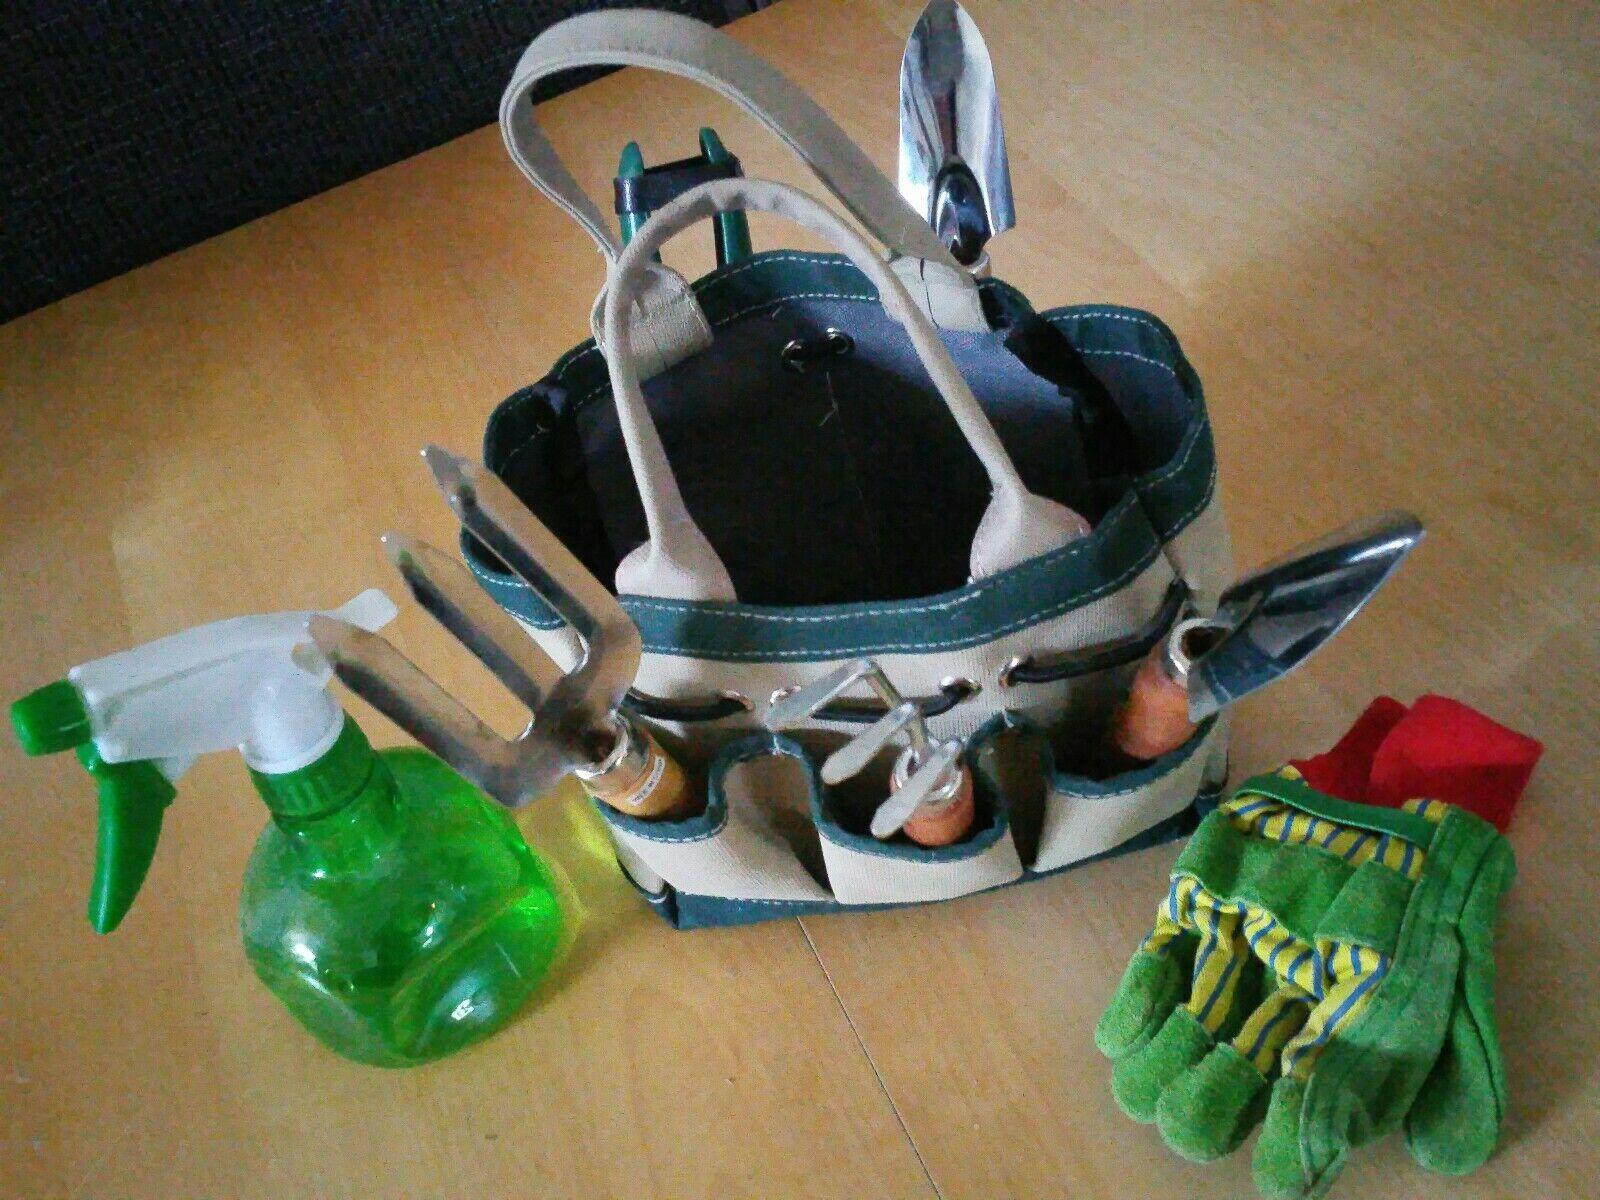 MINI Gardening Set ORGANIZER W/TOOLS IN CARRYING BAG 10